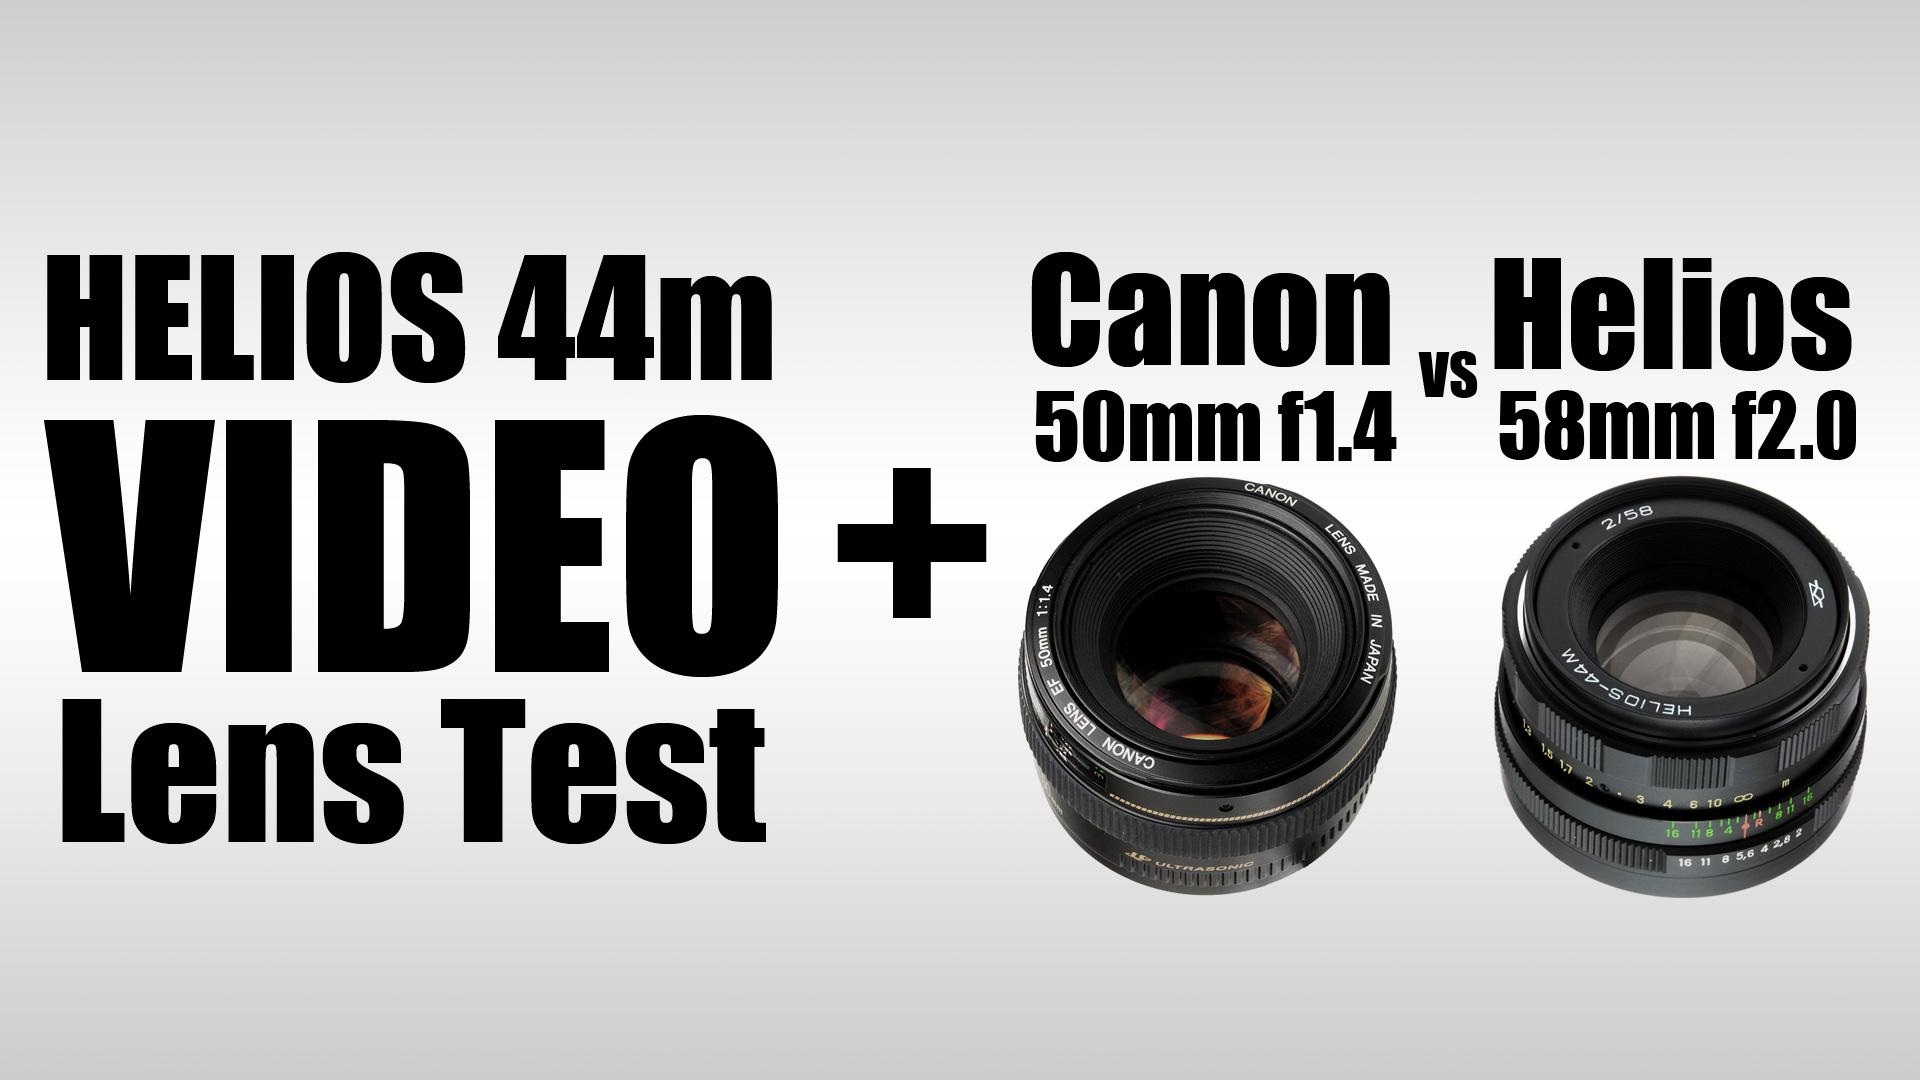 HELIOS 44m 58mm f/2 FIRST TEST + HELIOS vs Canon EF 50mm f/1.4